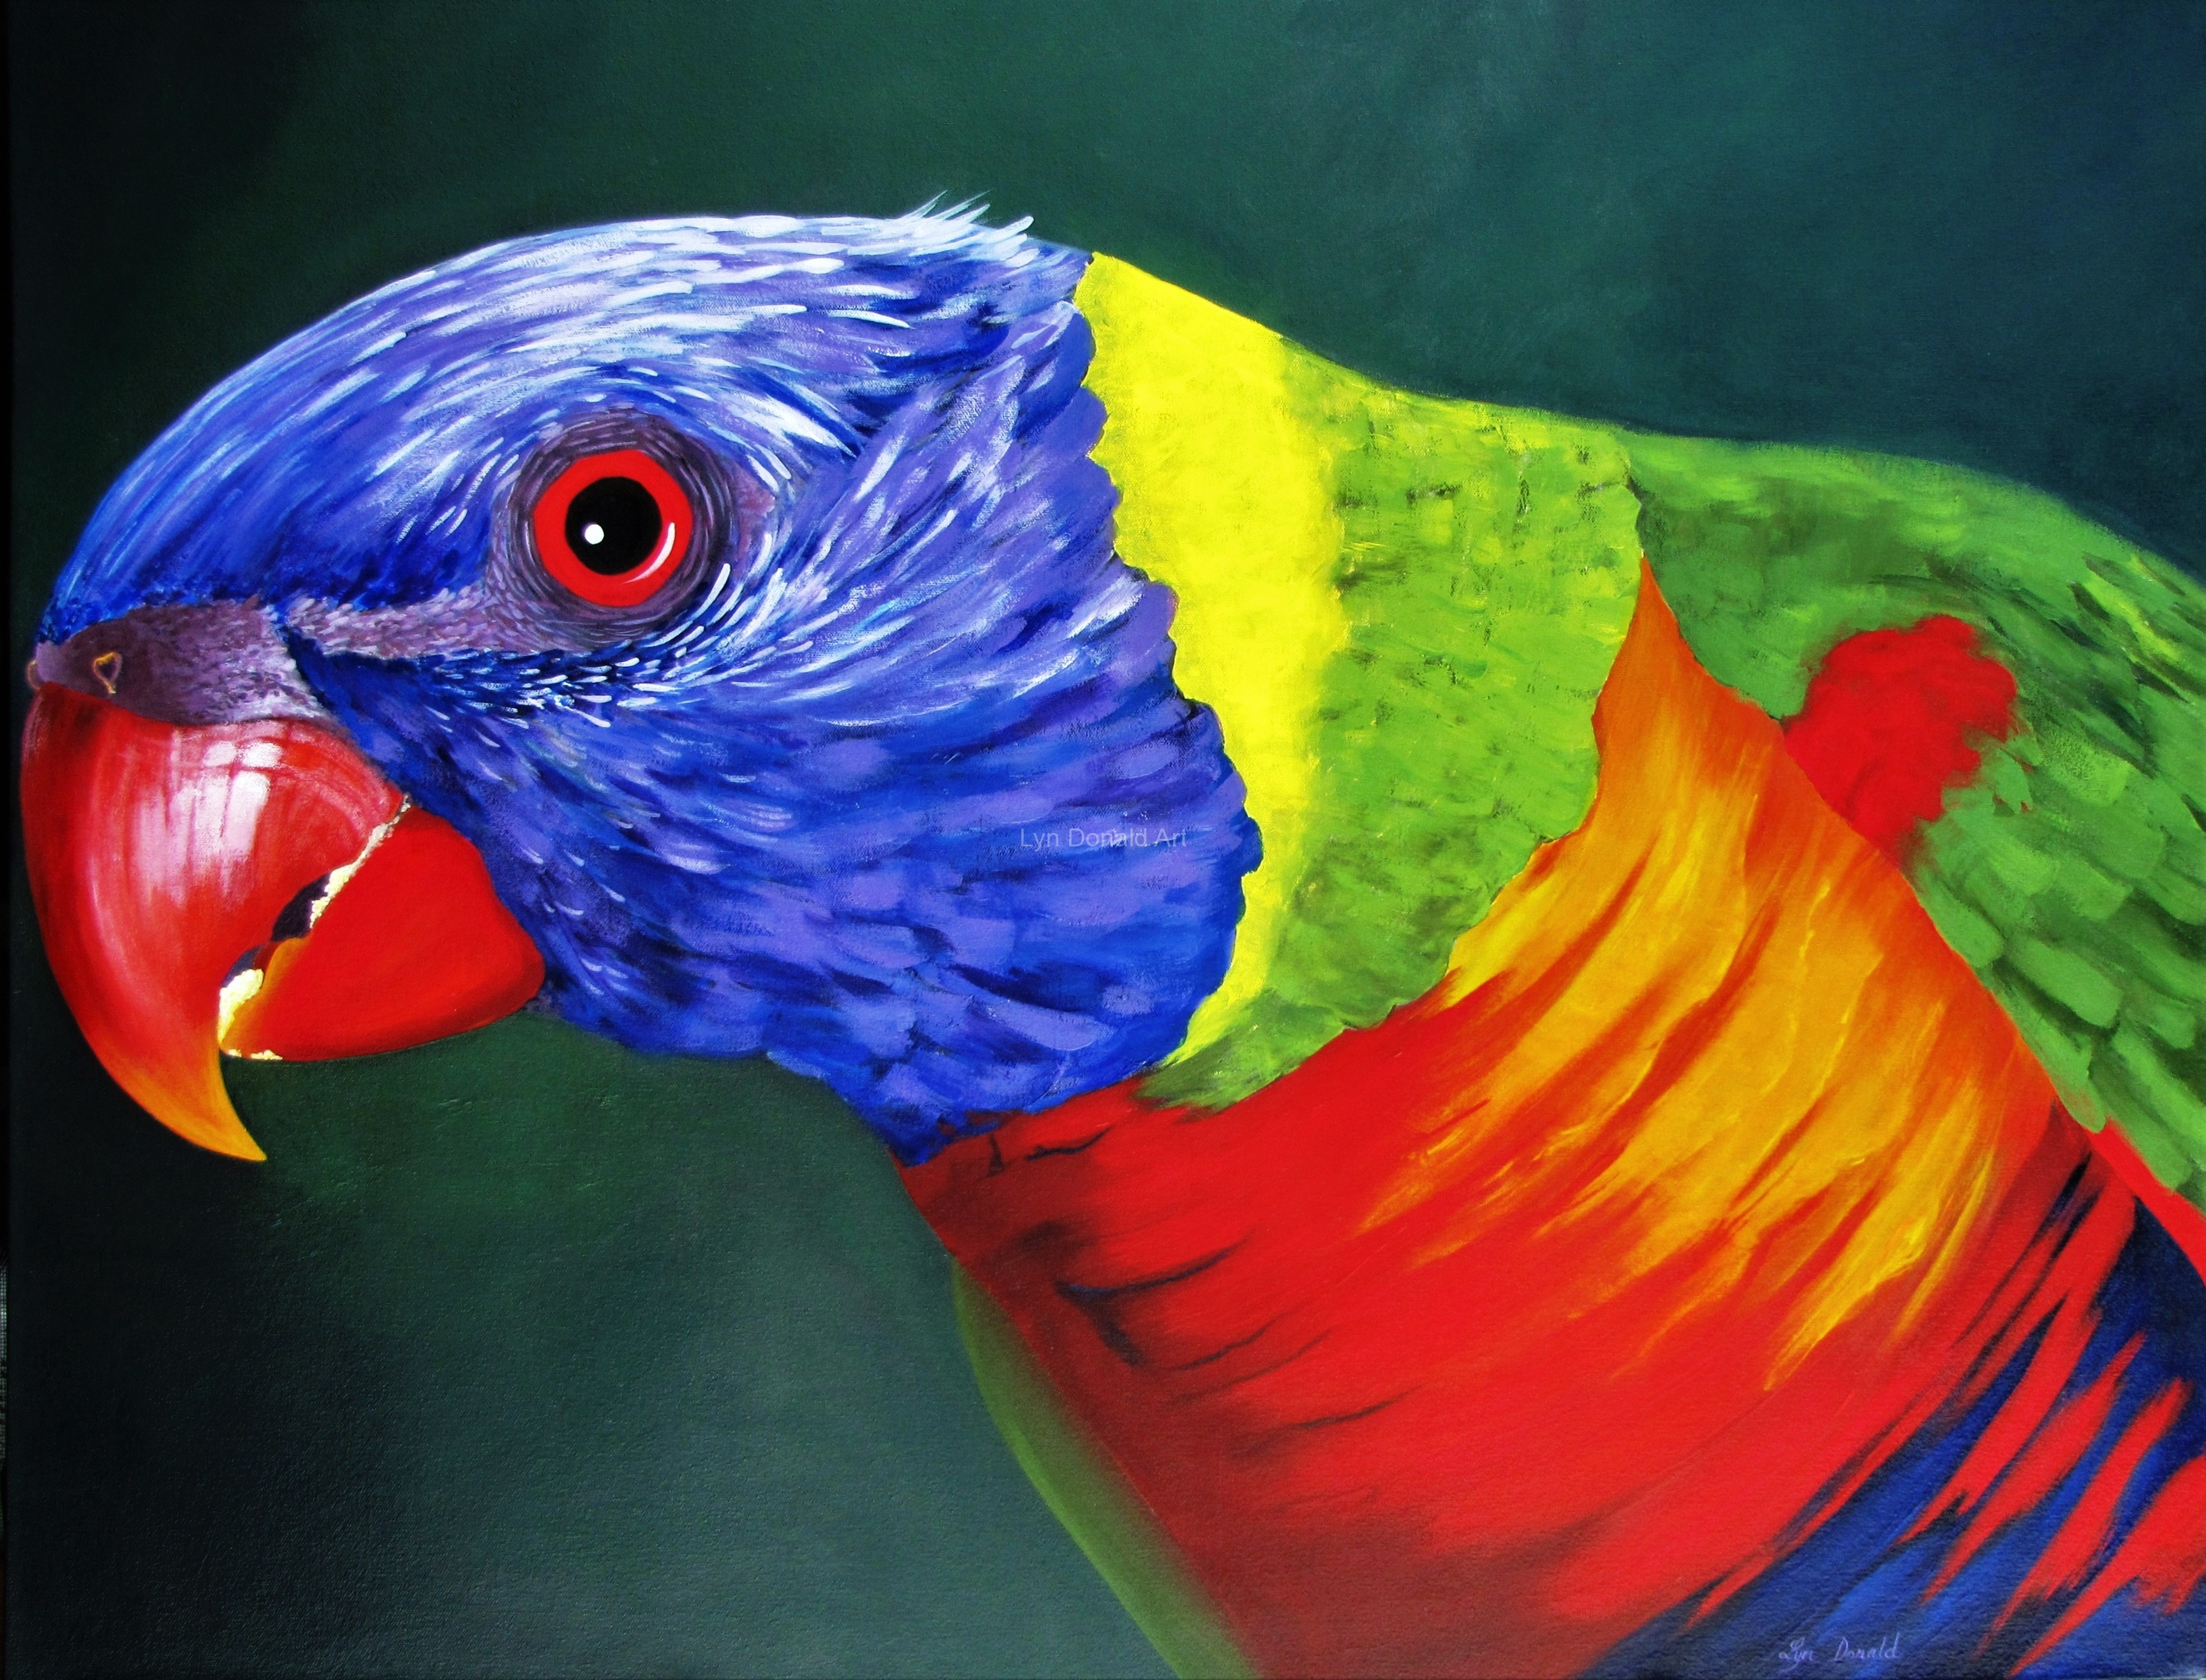 Colours-of-the-Rainbow-No-1-92-x-76cm-2-copy